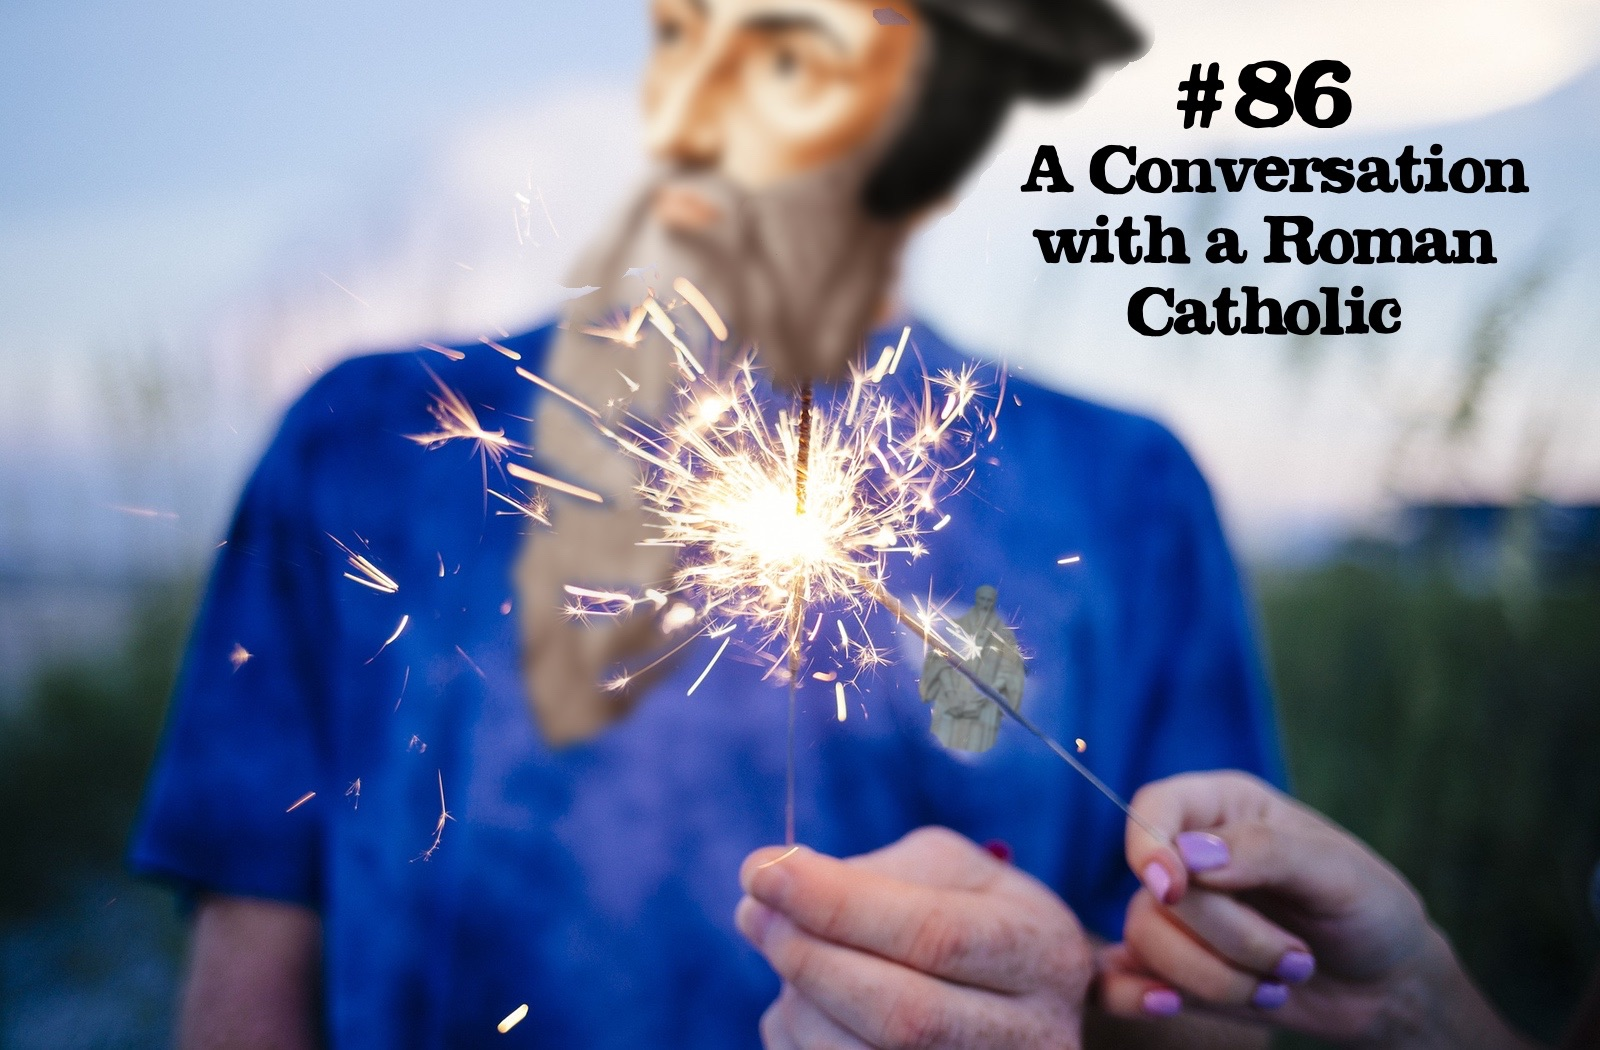 #86 A Conversation with a Roman Catholic